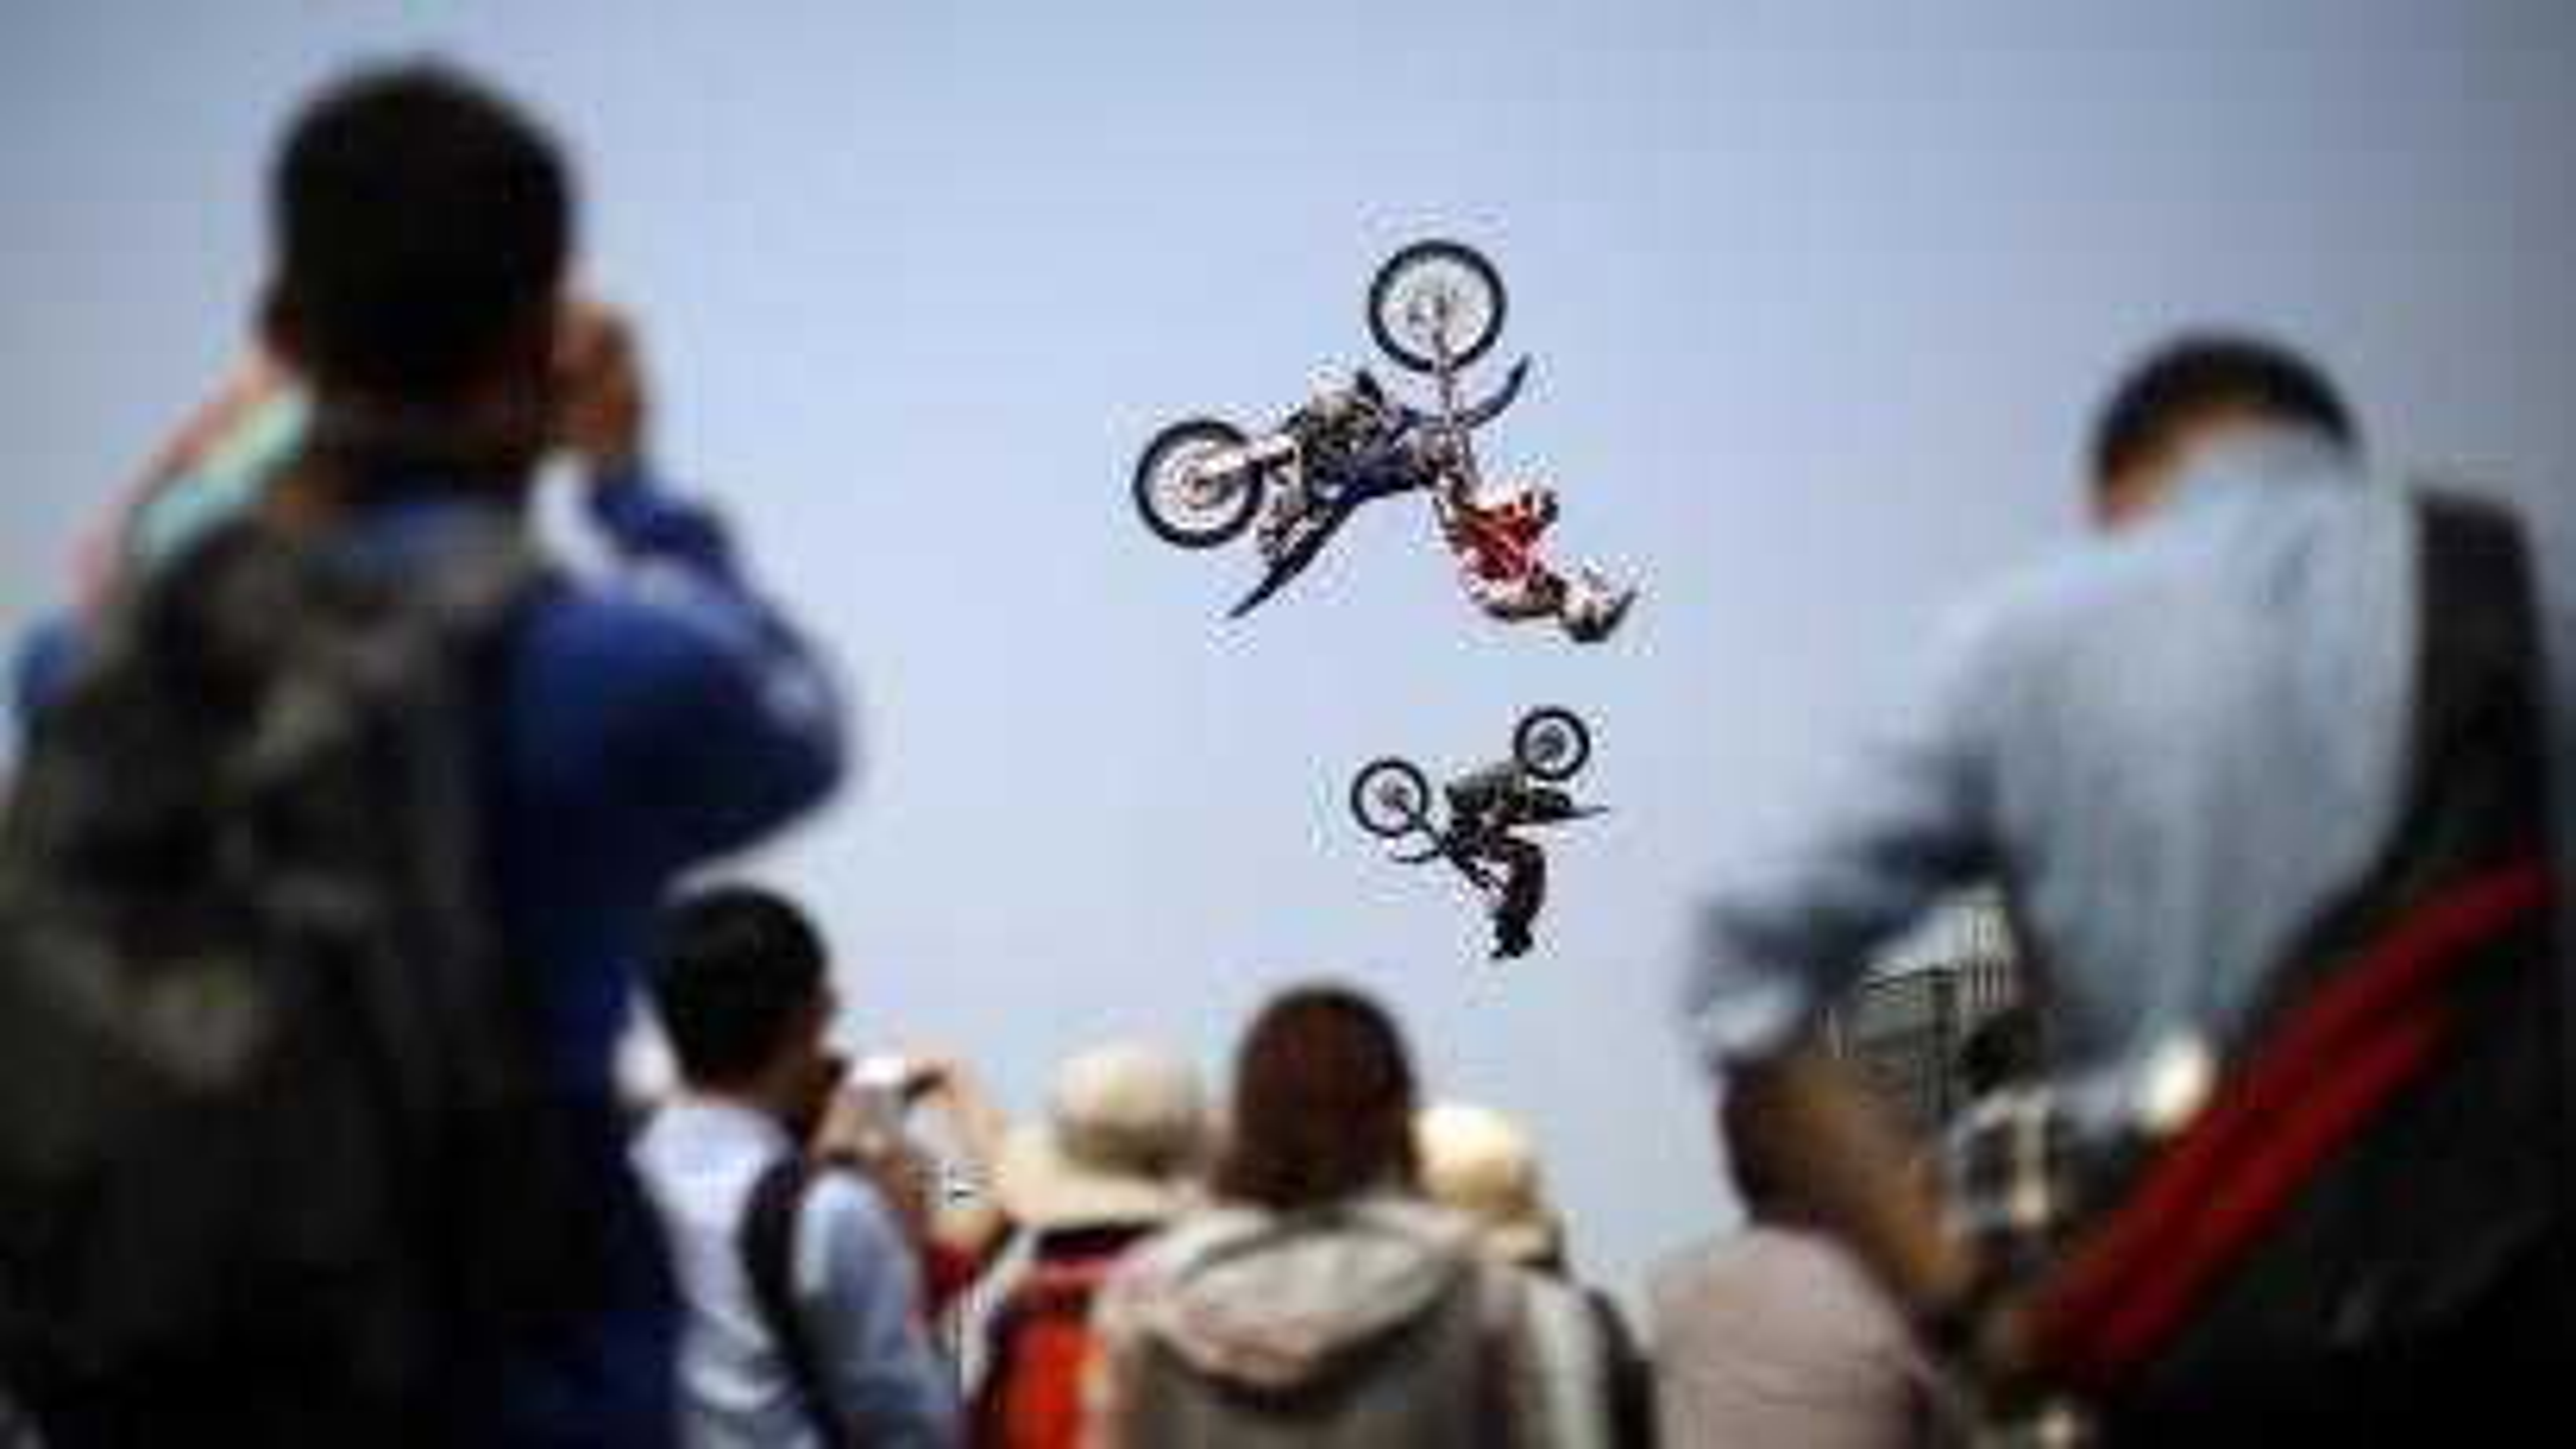 people doing bike tricks